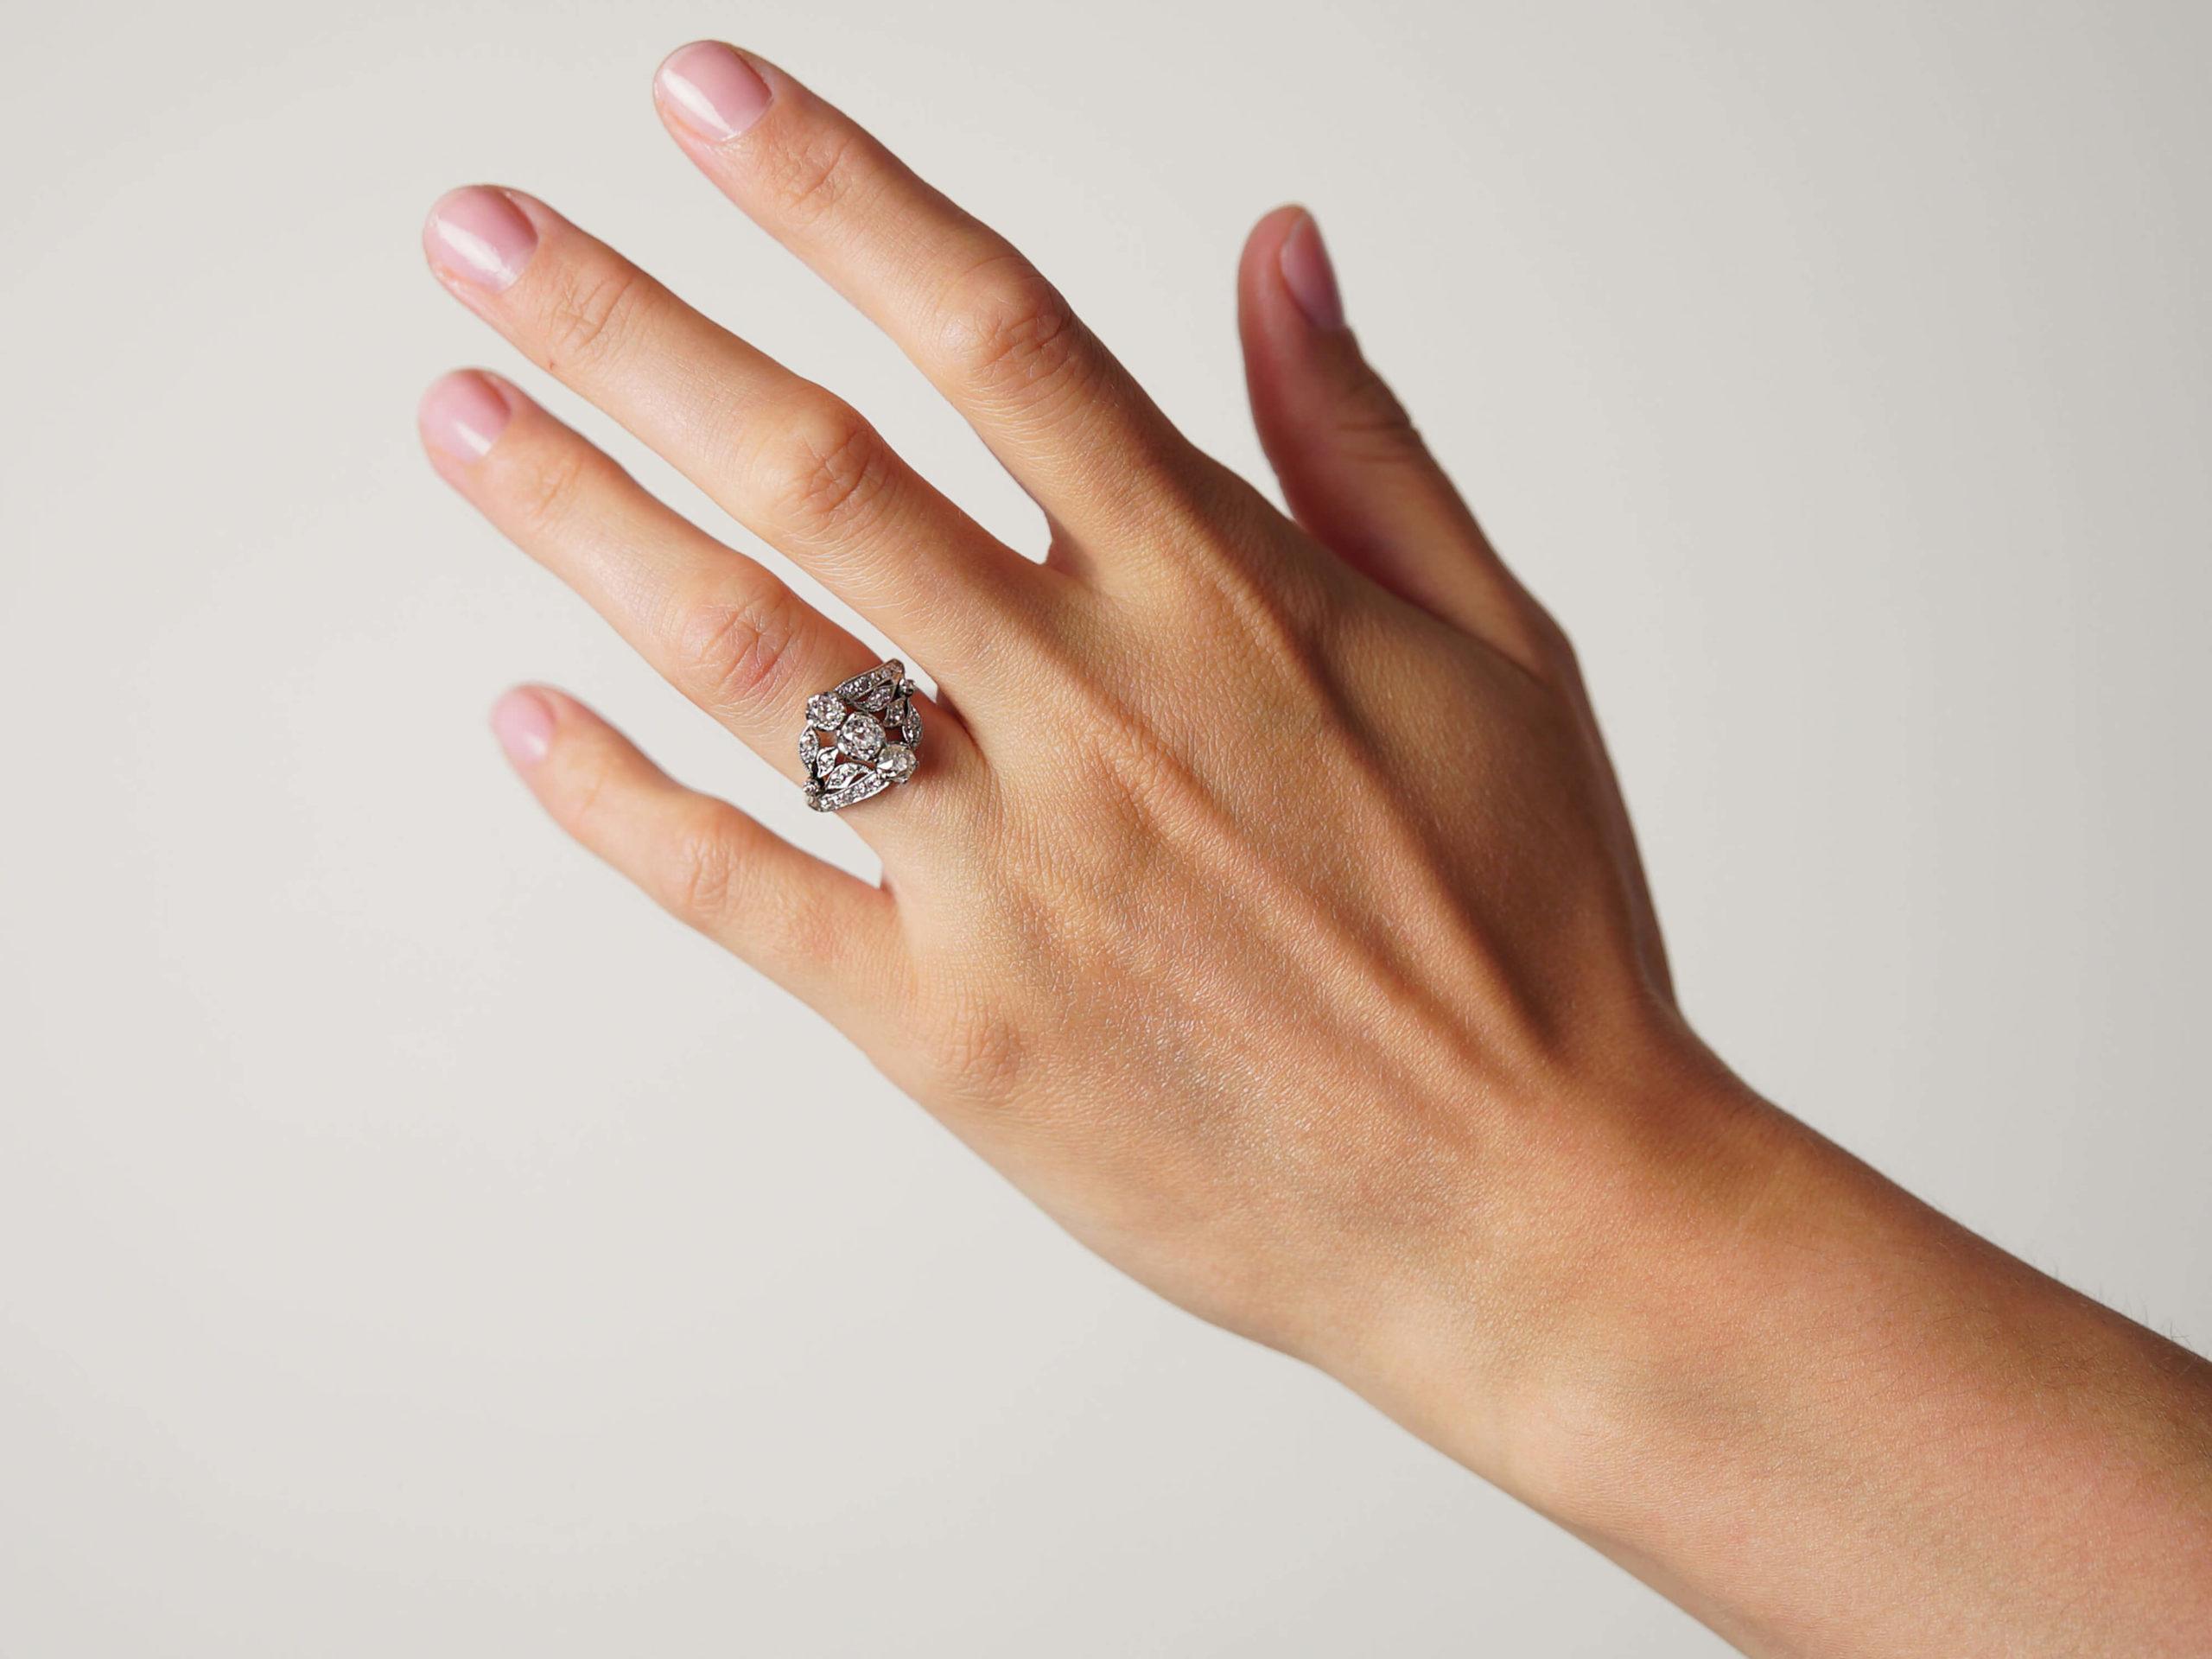 Belle Epoque 18ct Gold & Platinum Diamond Three Stone Ring with Leaf Shoulders